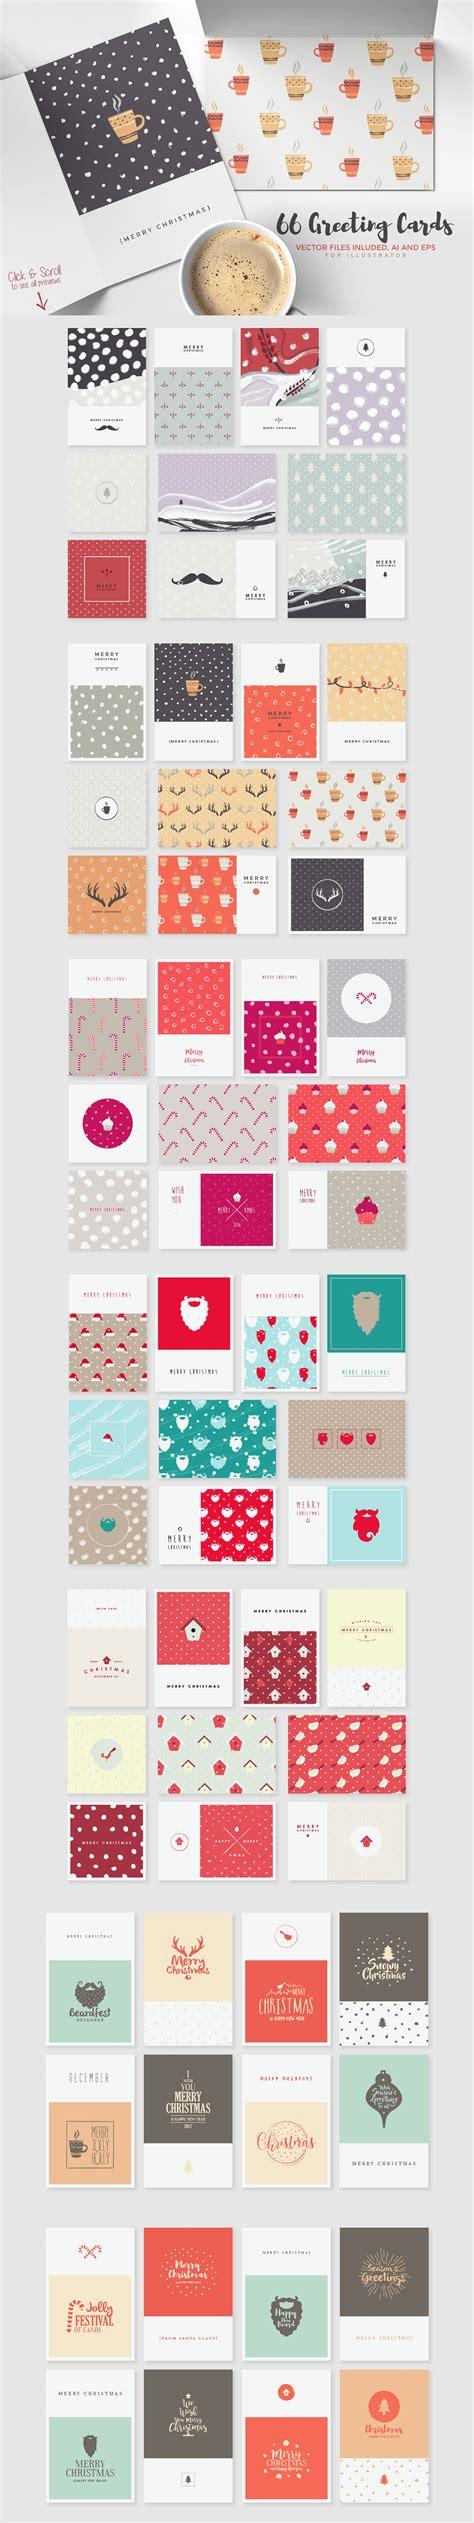 design elements ltd christmas bundle of 400 design elements from graphicdome